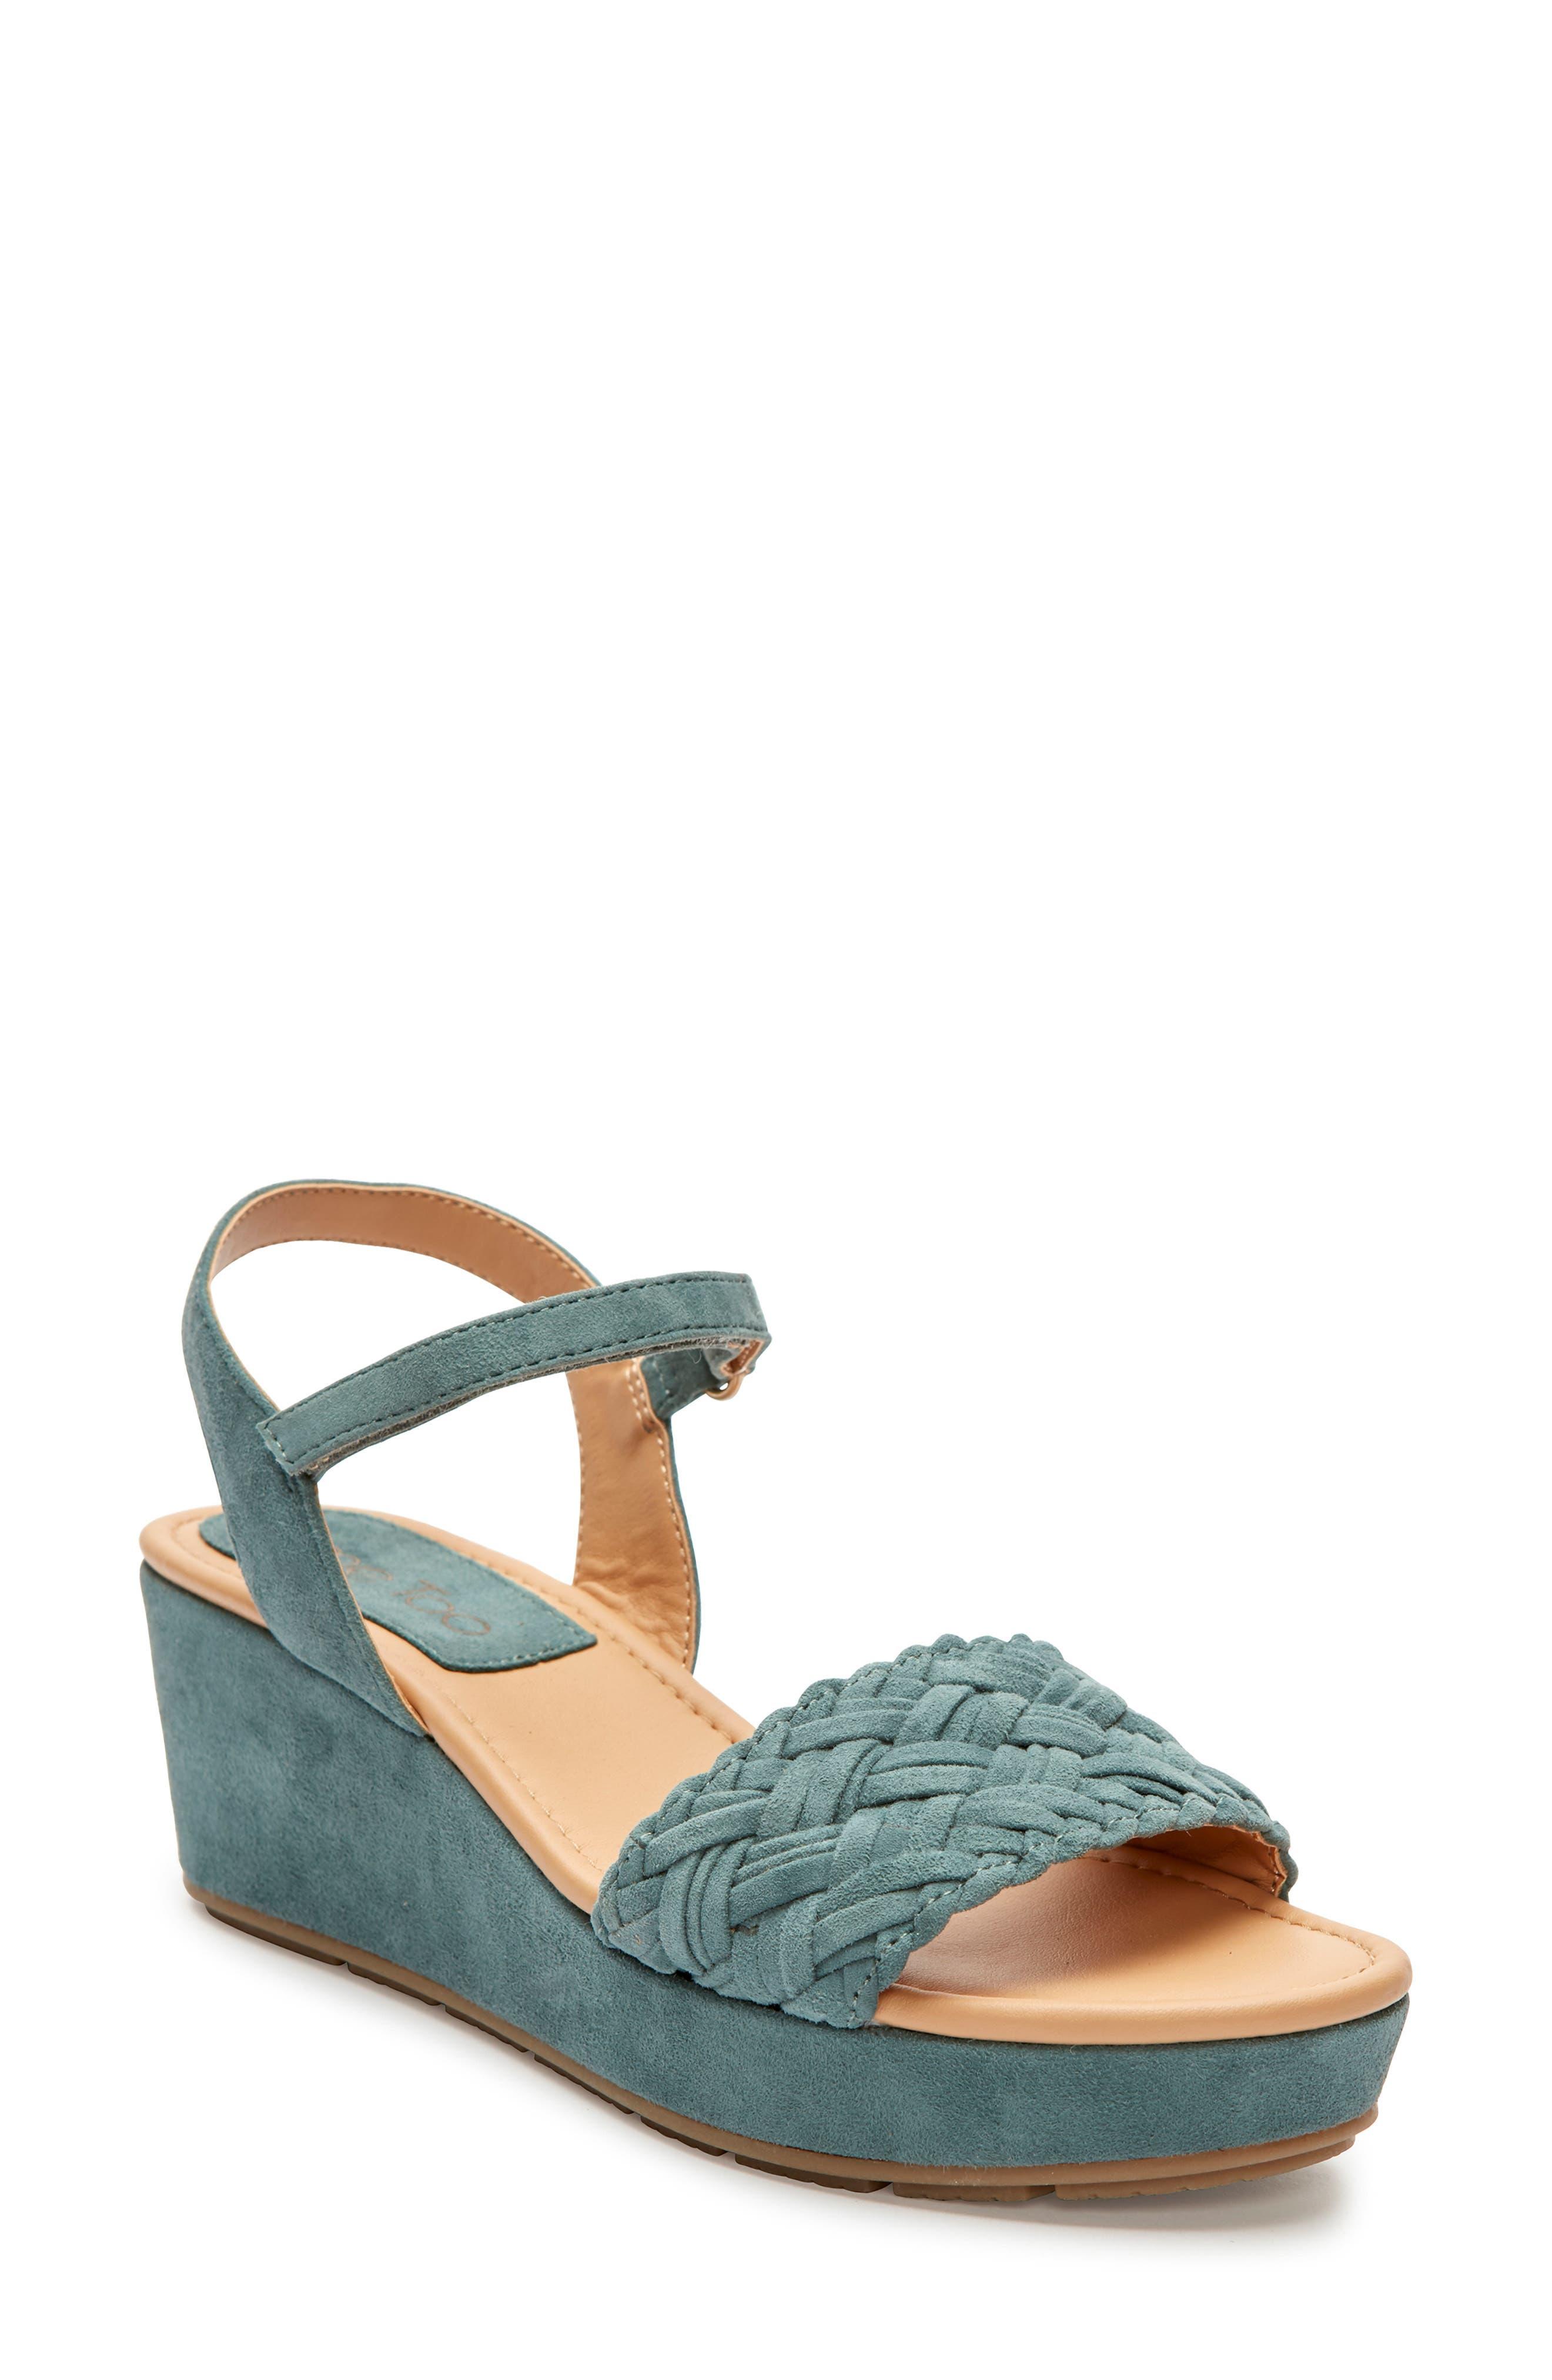 Me Too Abella Wedge Sandal- Blue